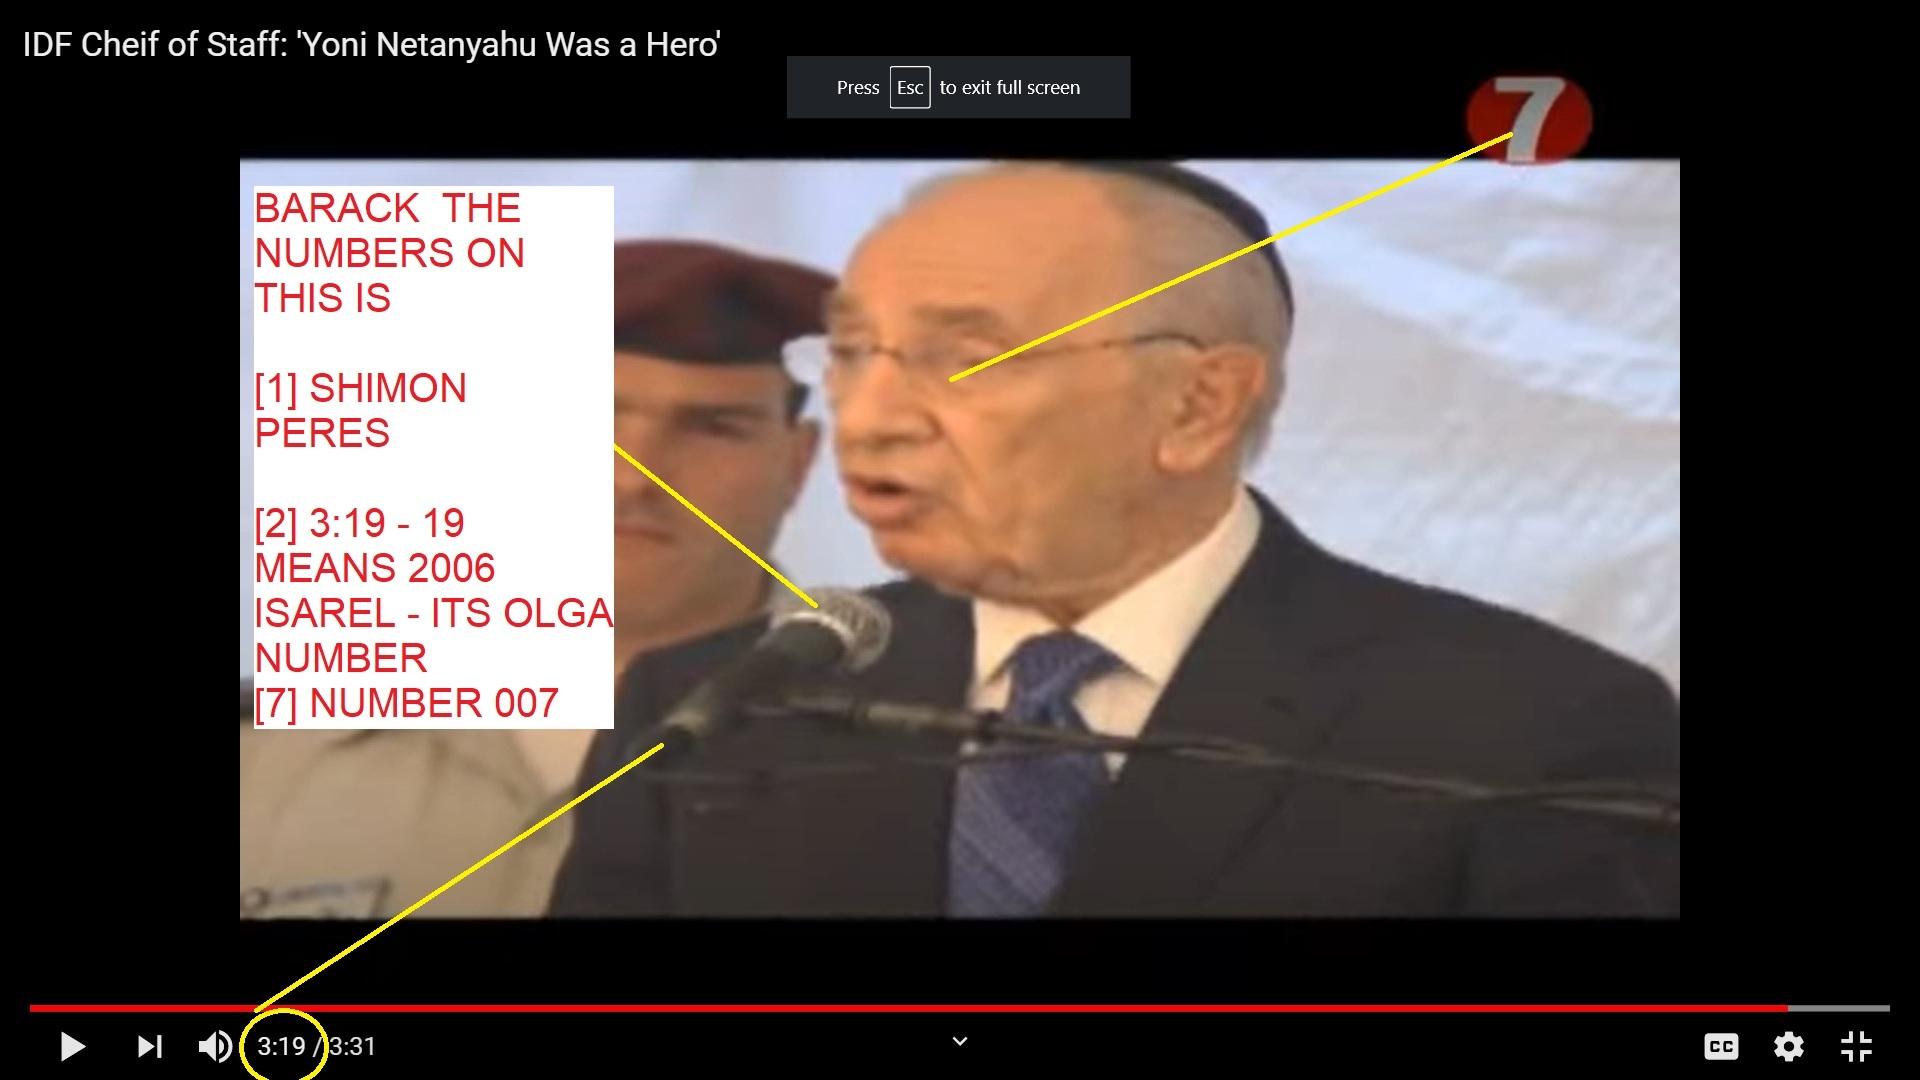 SHIMON PERES YONI NETANAYHU THE 1987 GAUSSIAN PRIME NUMBER 643361467 NUMBERS